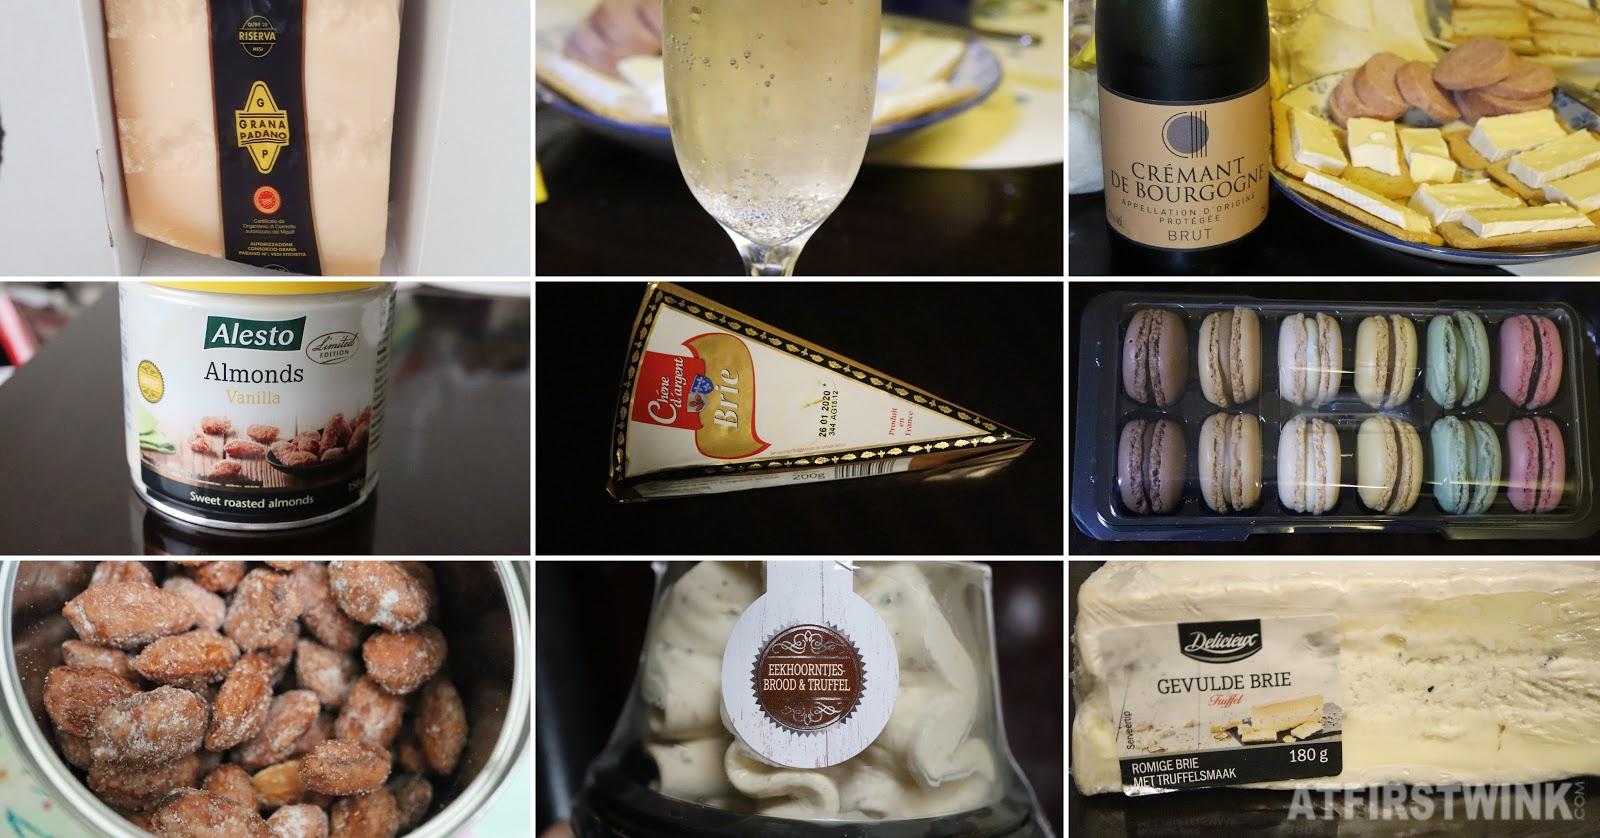 Lidl cremant de bourgogne brut brie toasts almonds grana padano cream cheese truffle macarons